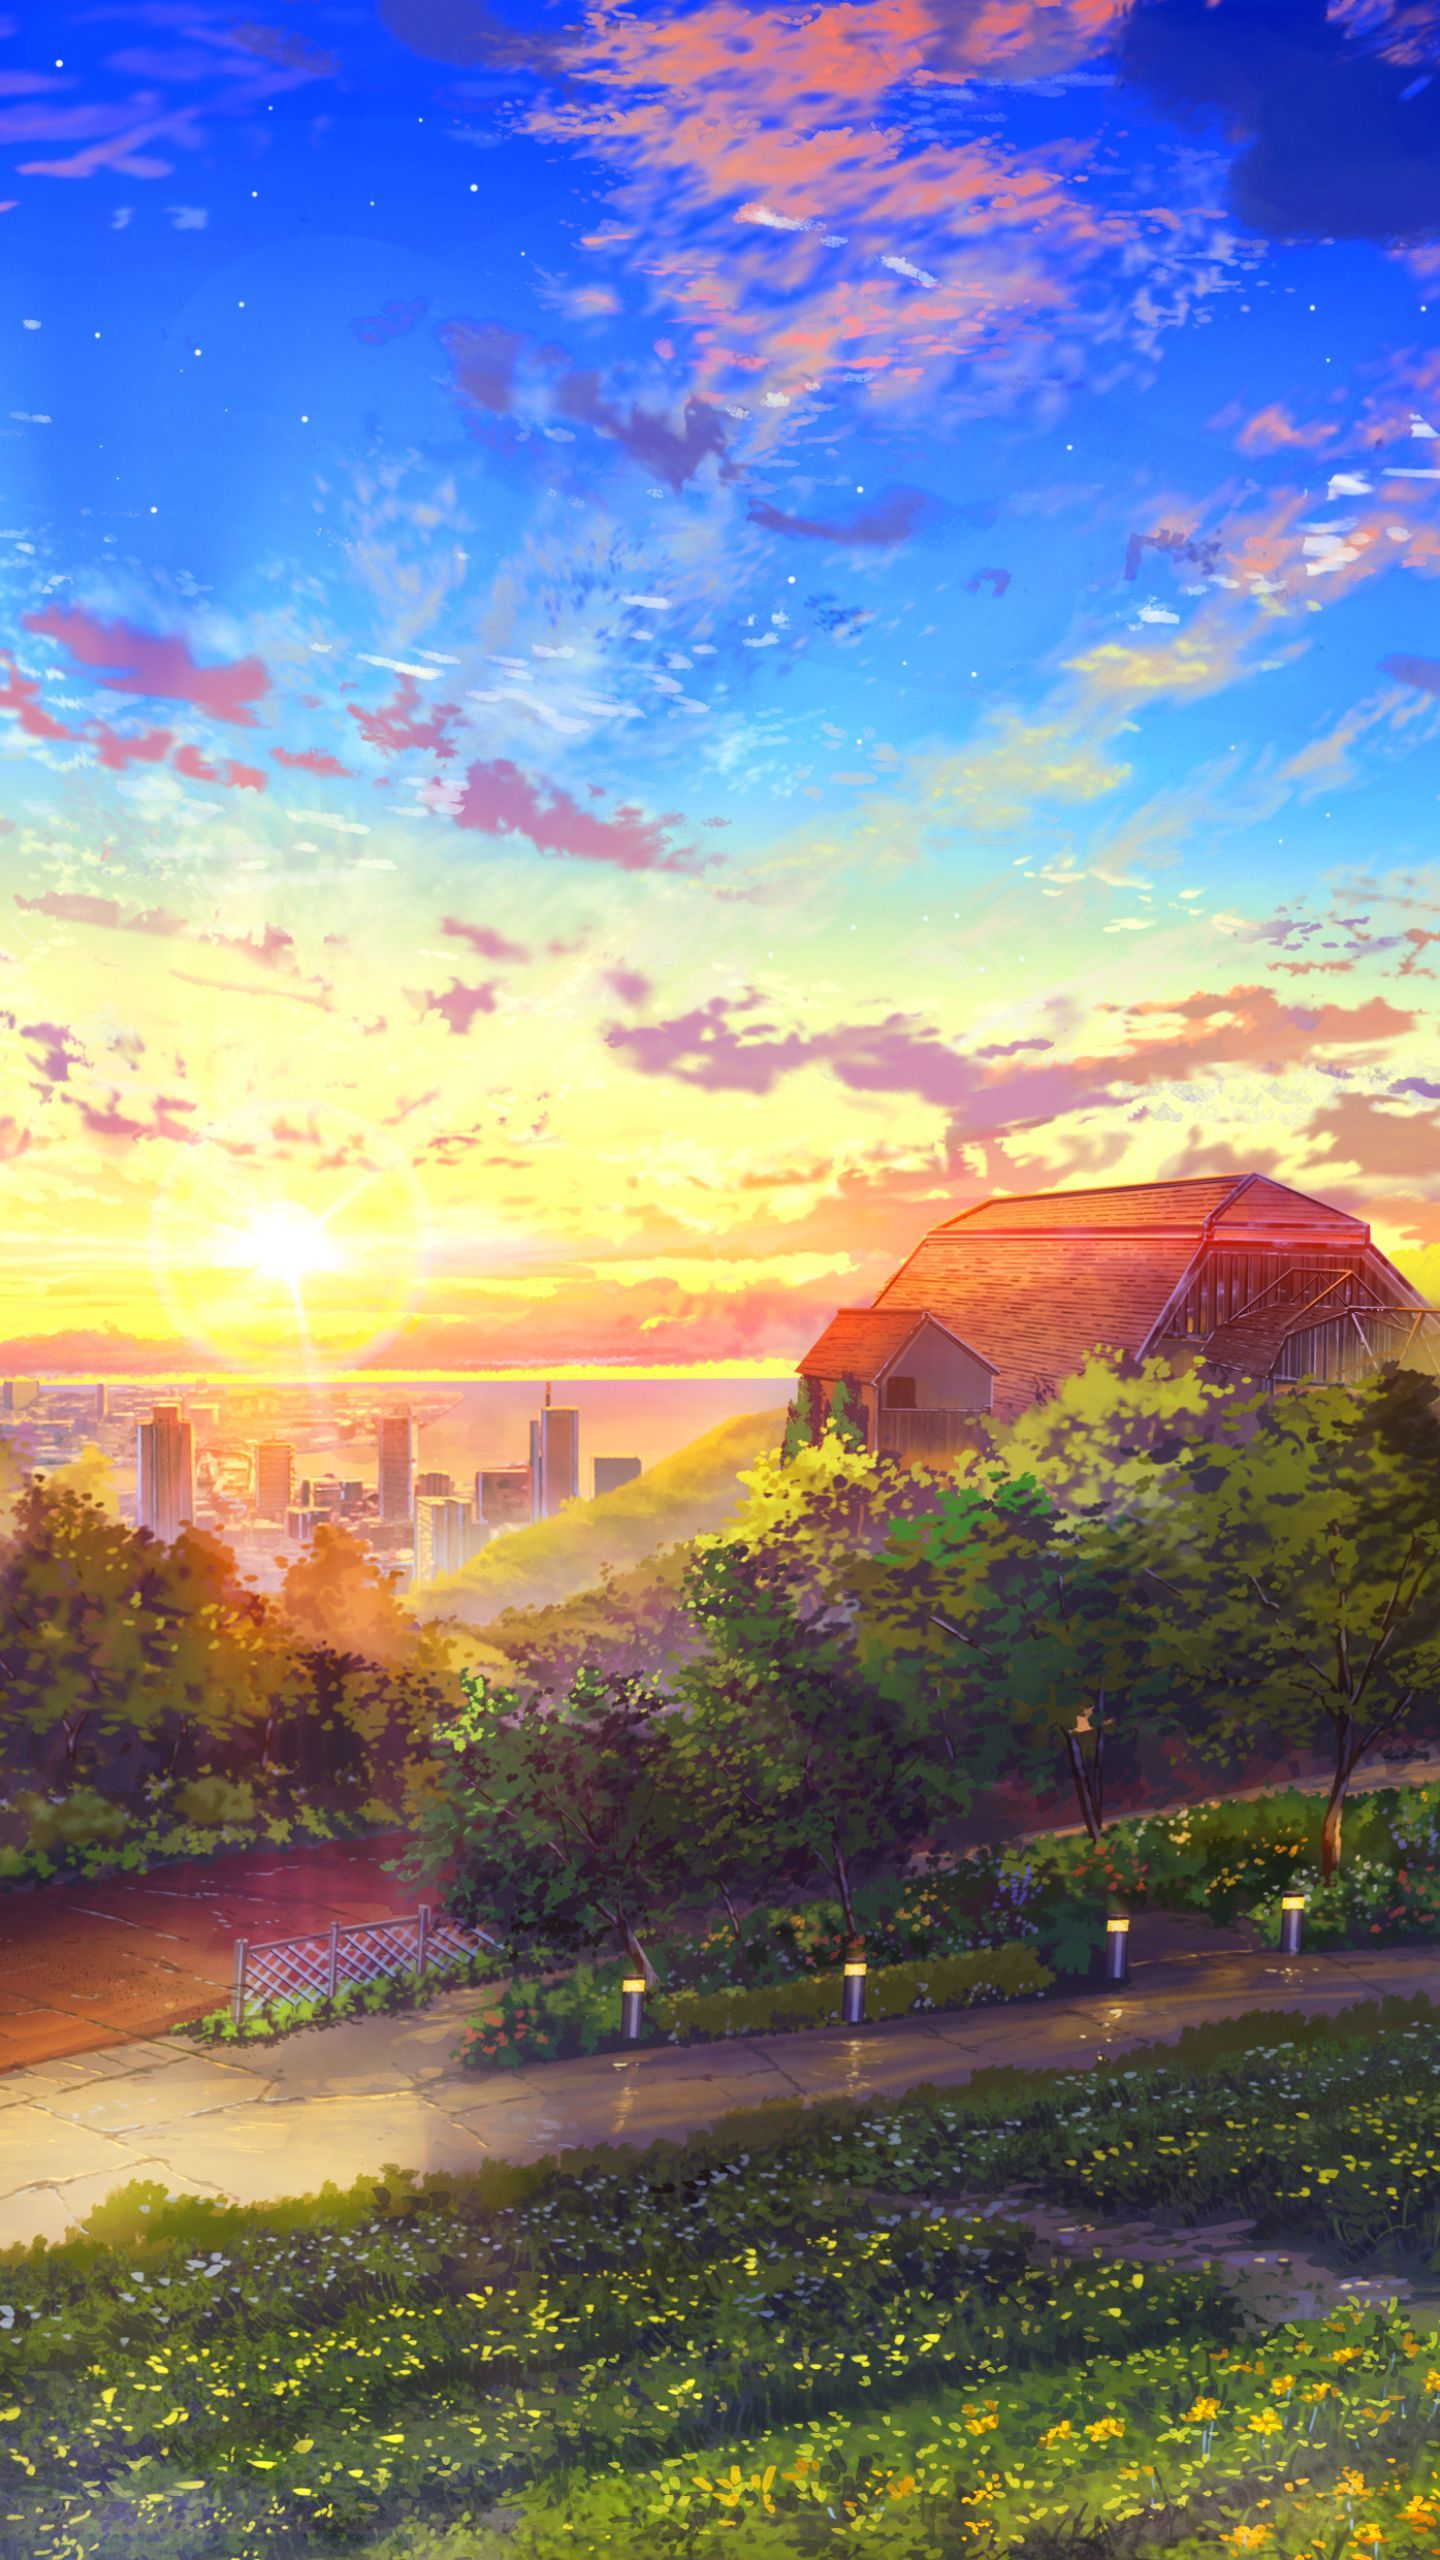 Anime Landscape Wallpaper Phone Anime Landscape 1440x2560